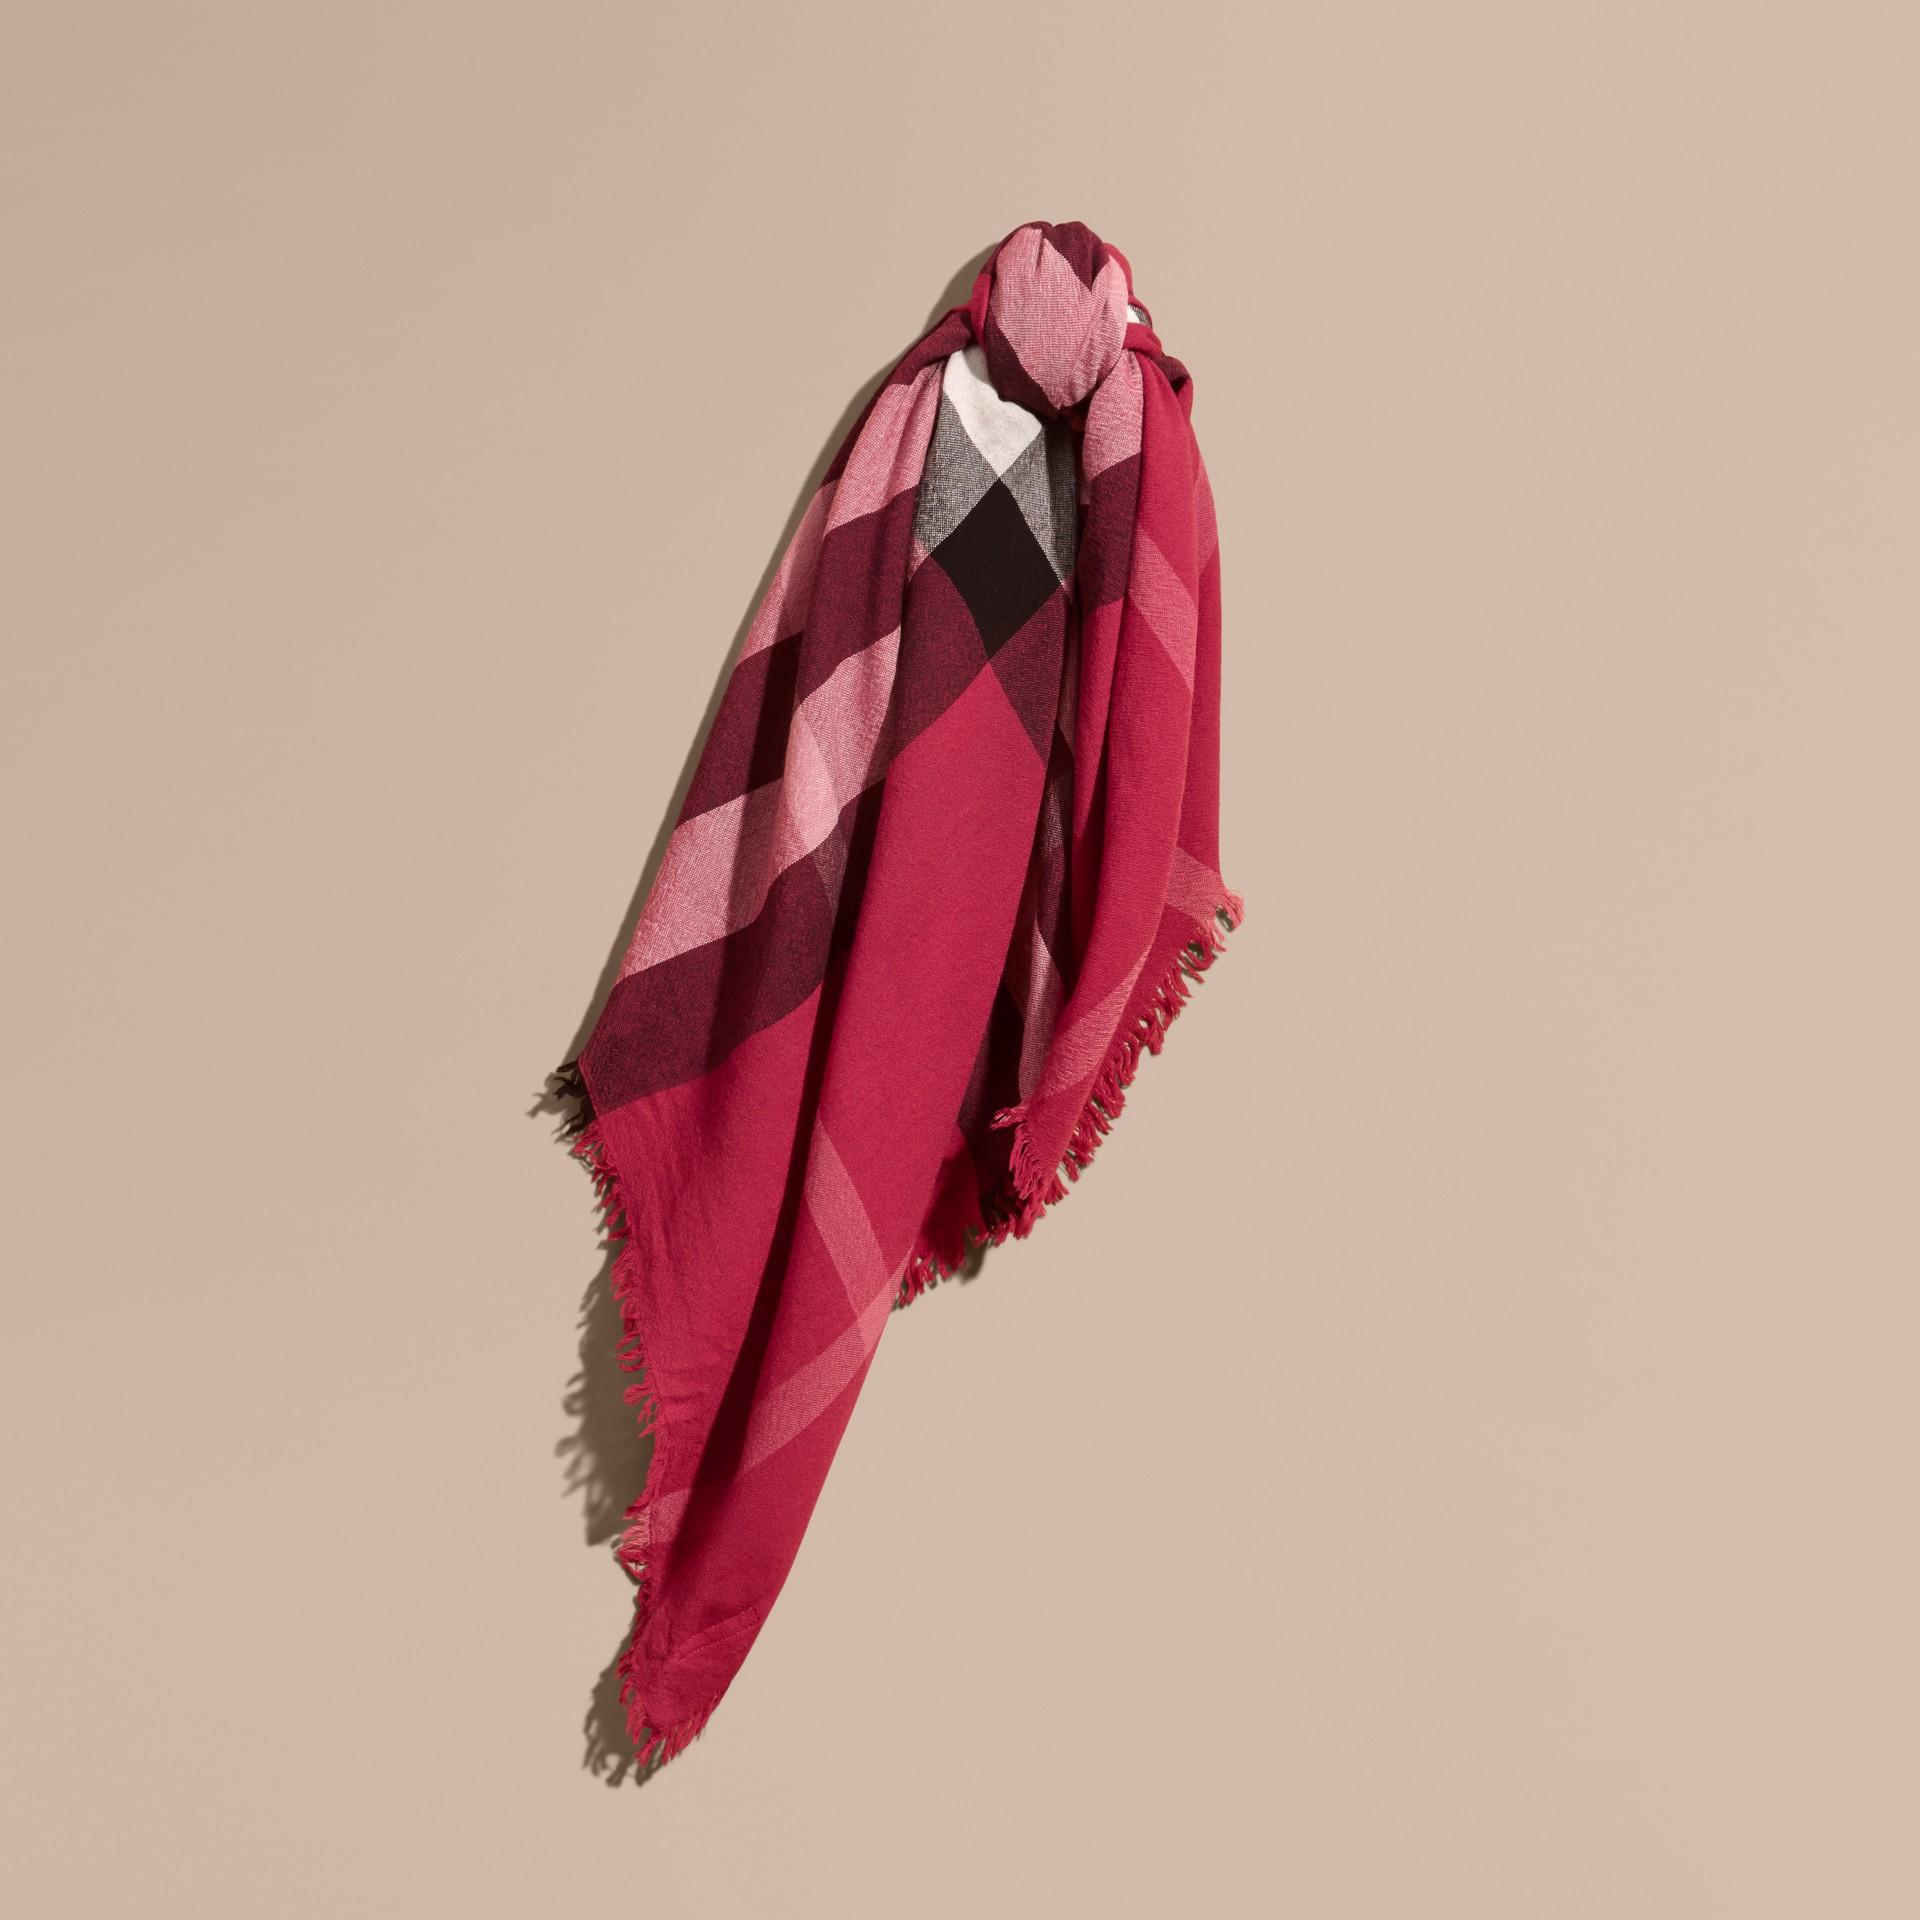 Dark plum pink Lenço grande de lã Merino com estampa xadrez Dark Plum Pink - galeria de imagens 1